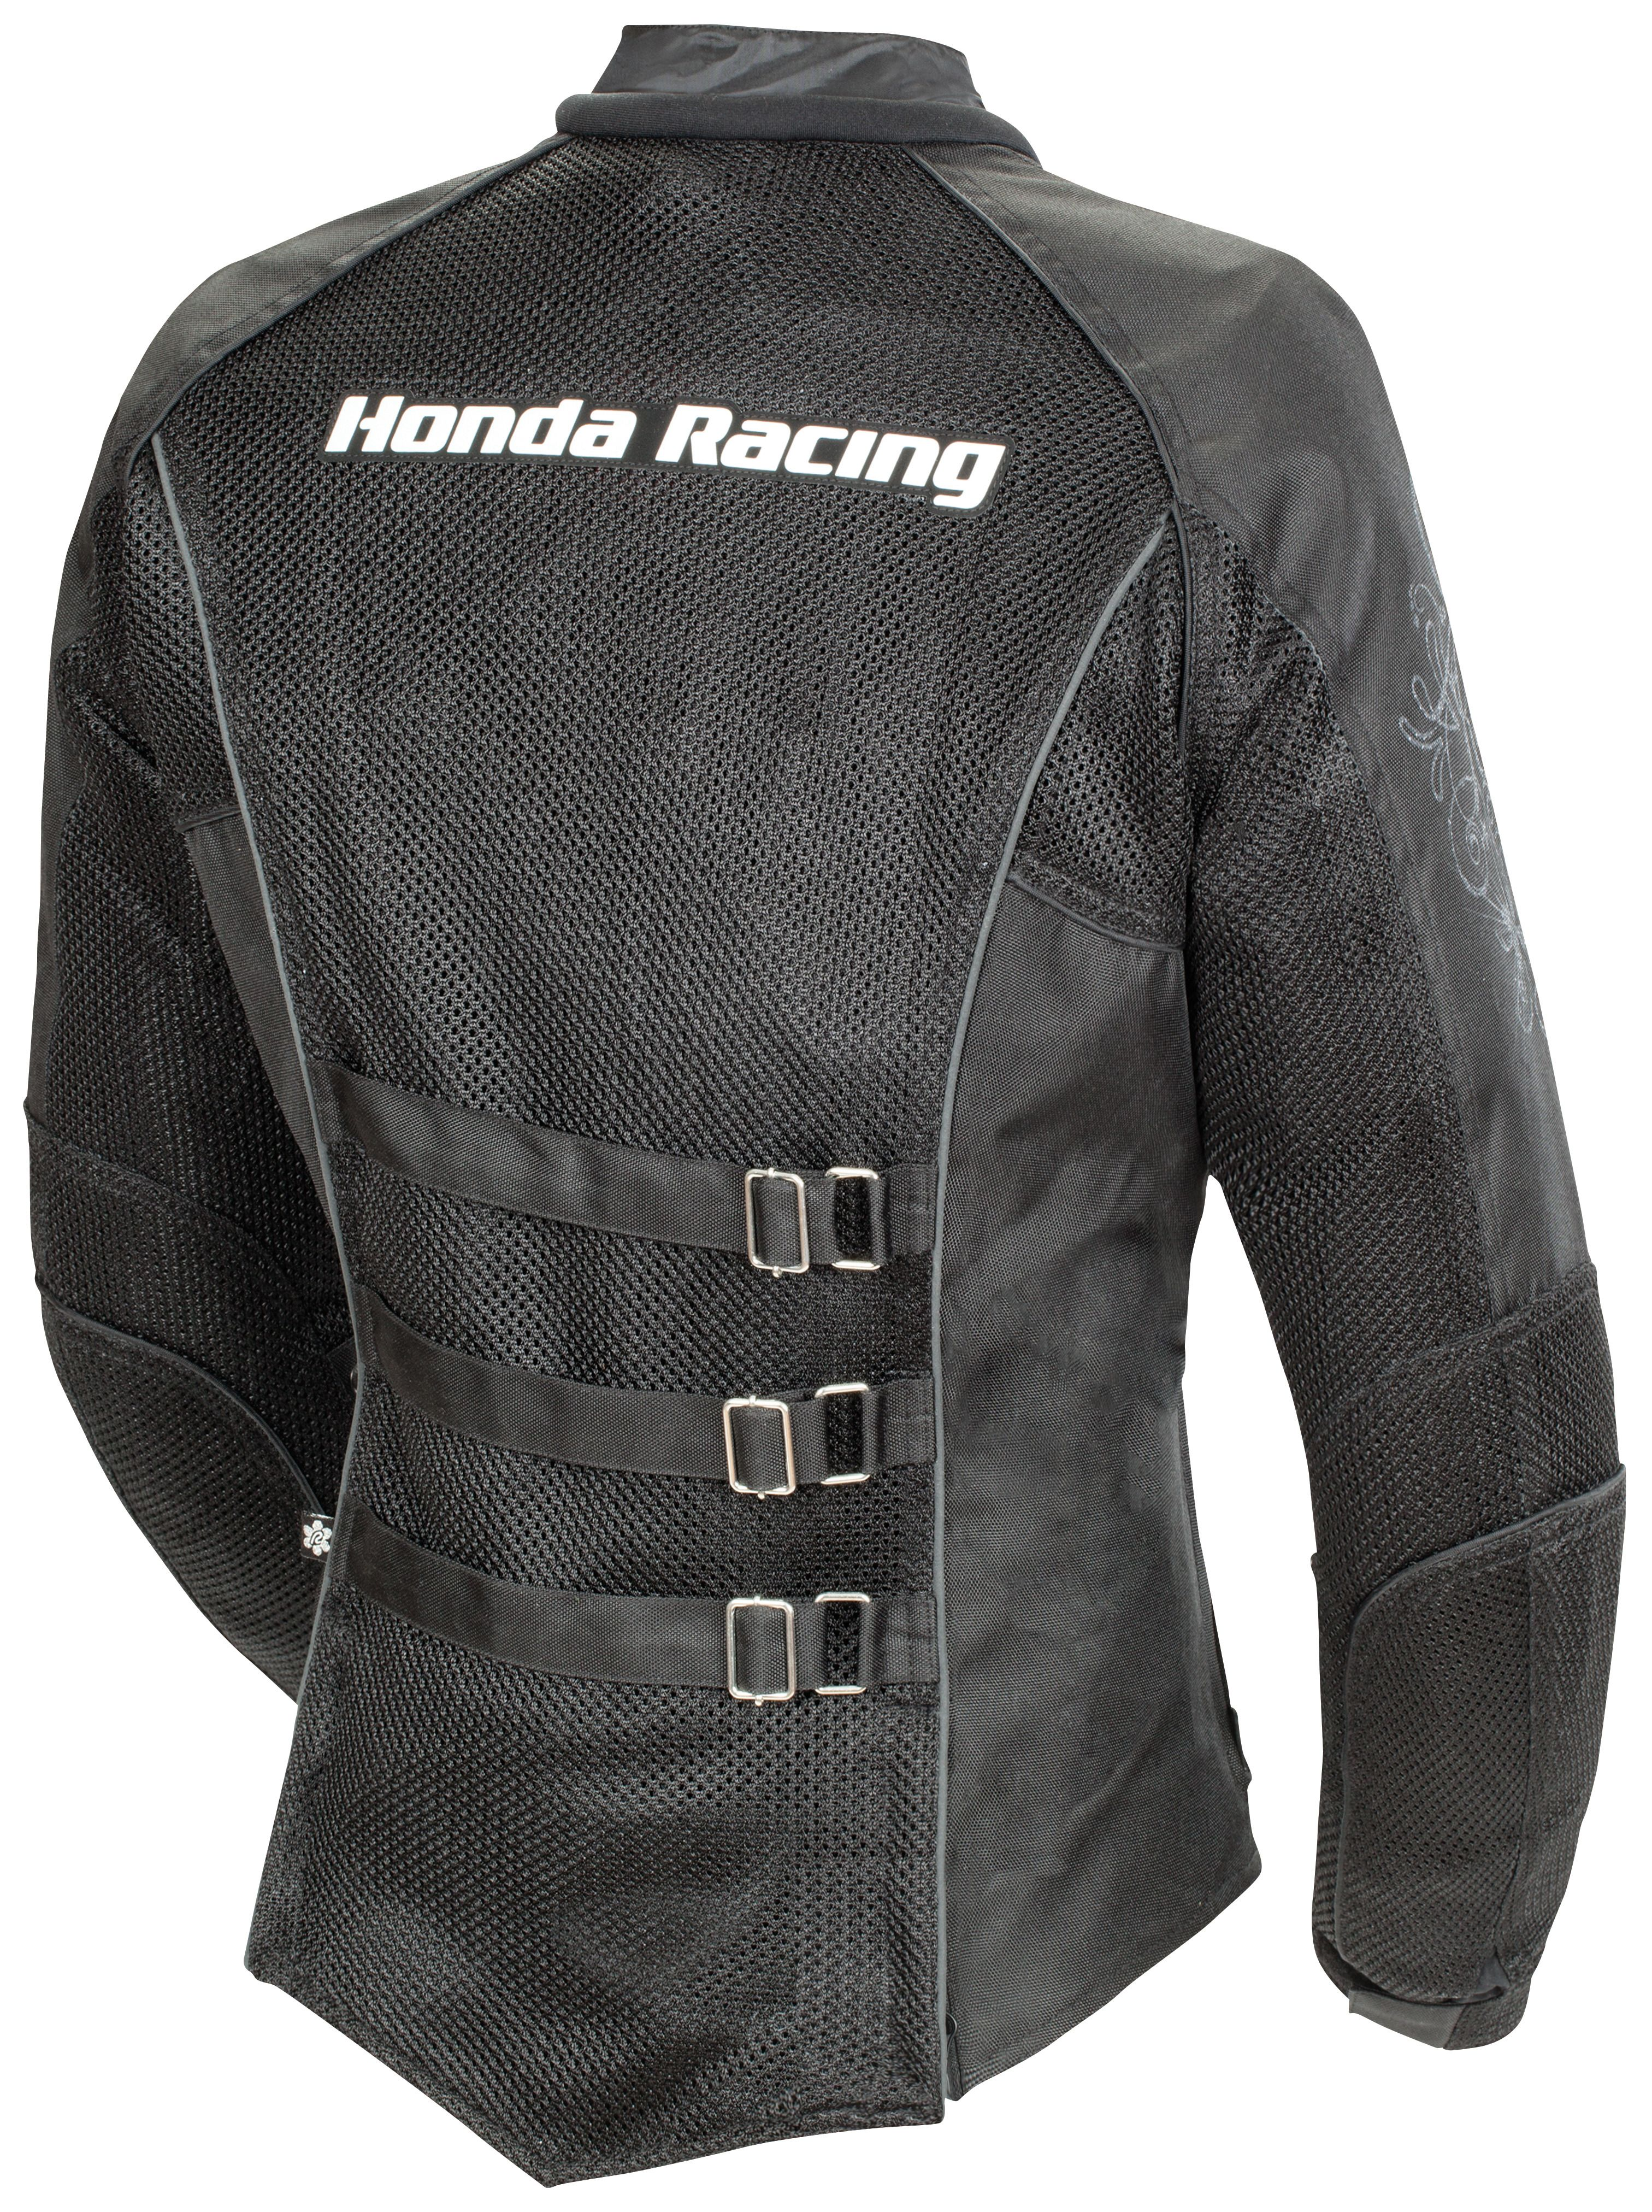 Joe Rocket Honda Speedmesh Womenu0027s Jacket (Size XL Only) | 20% ($38.00)  Off!   RevZilla